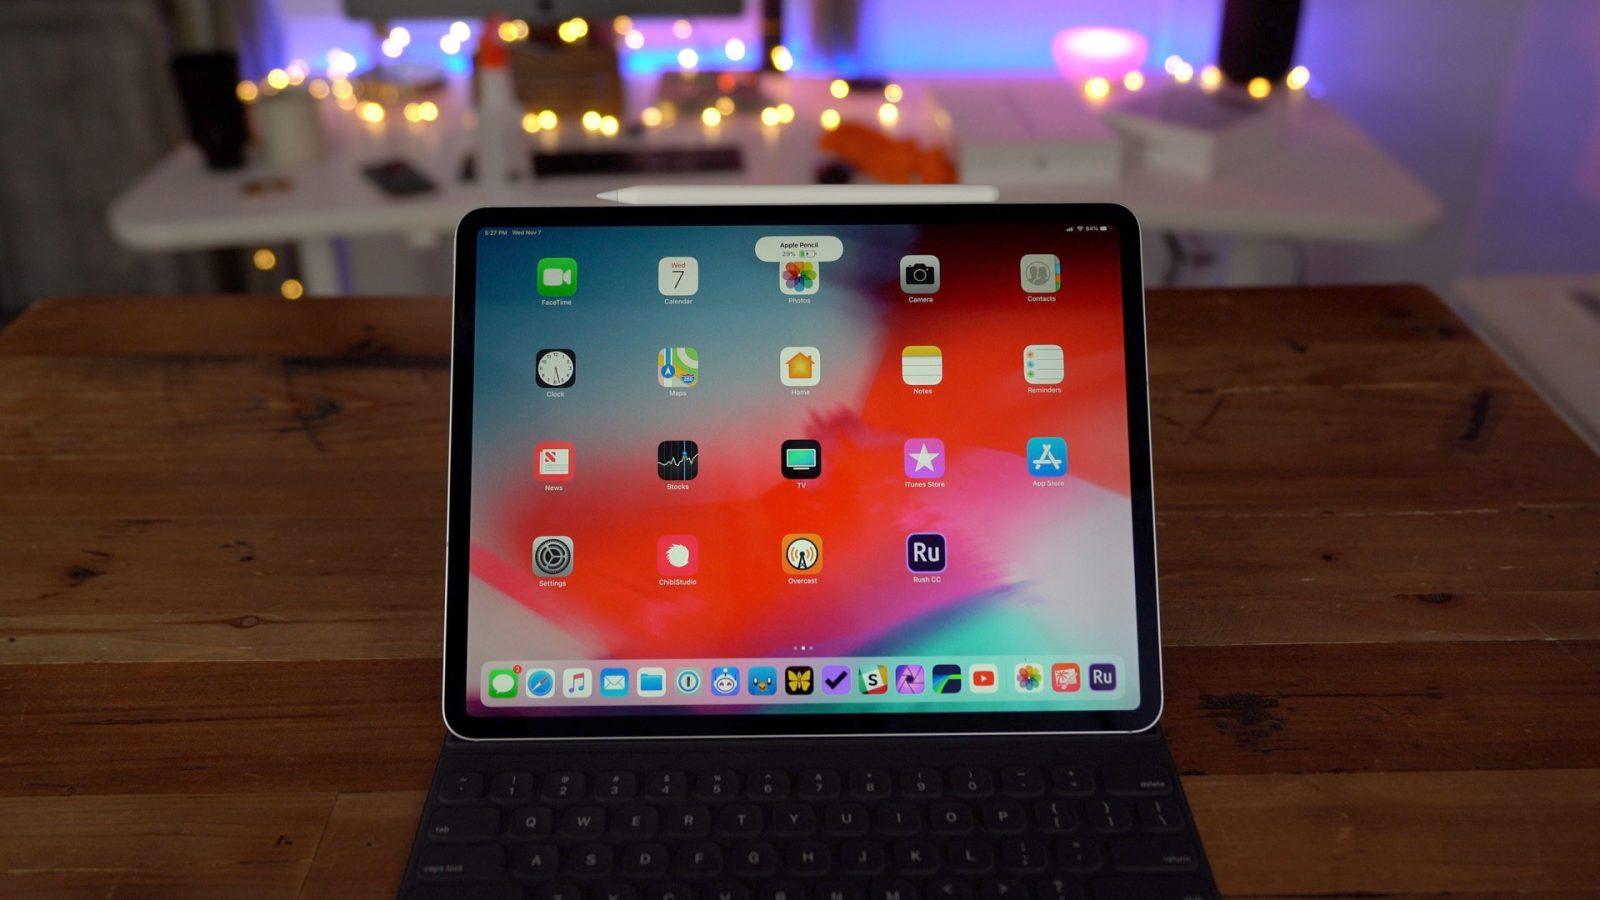 ipad pro user guide apple